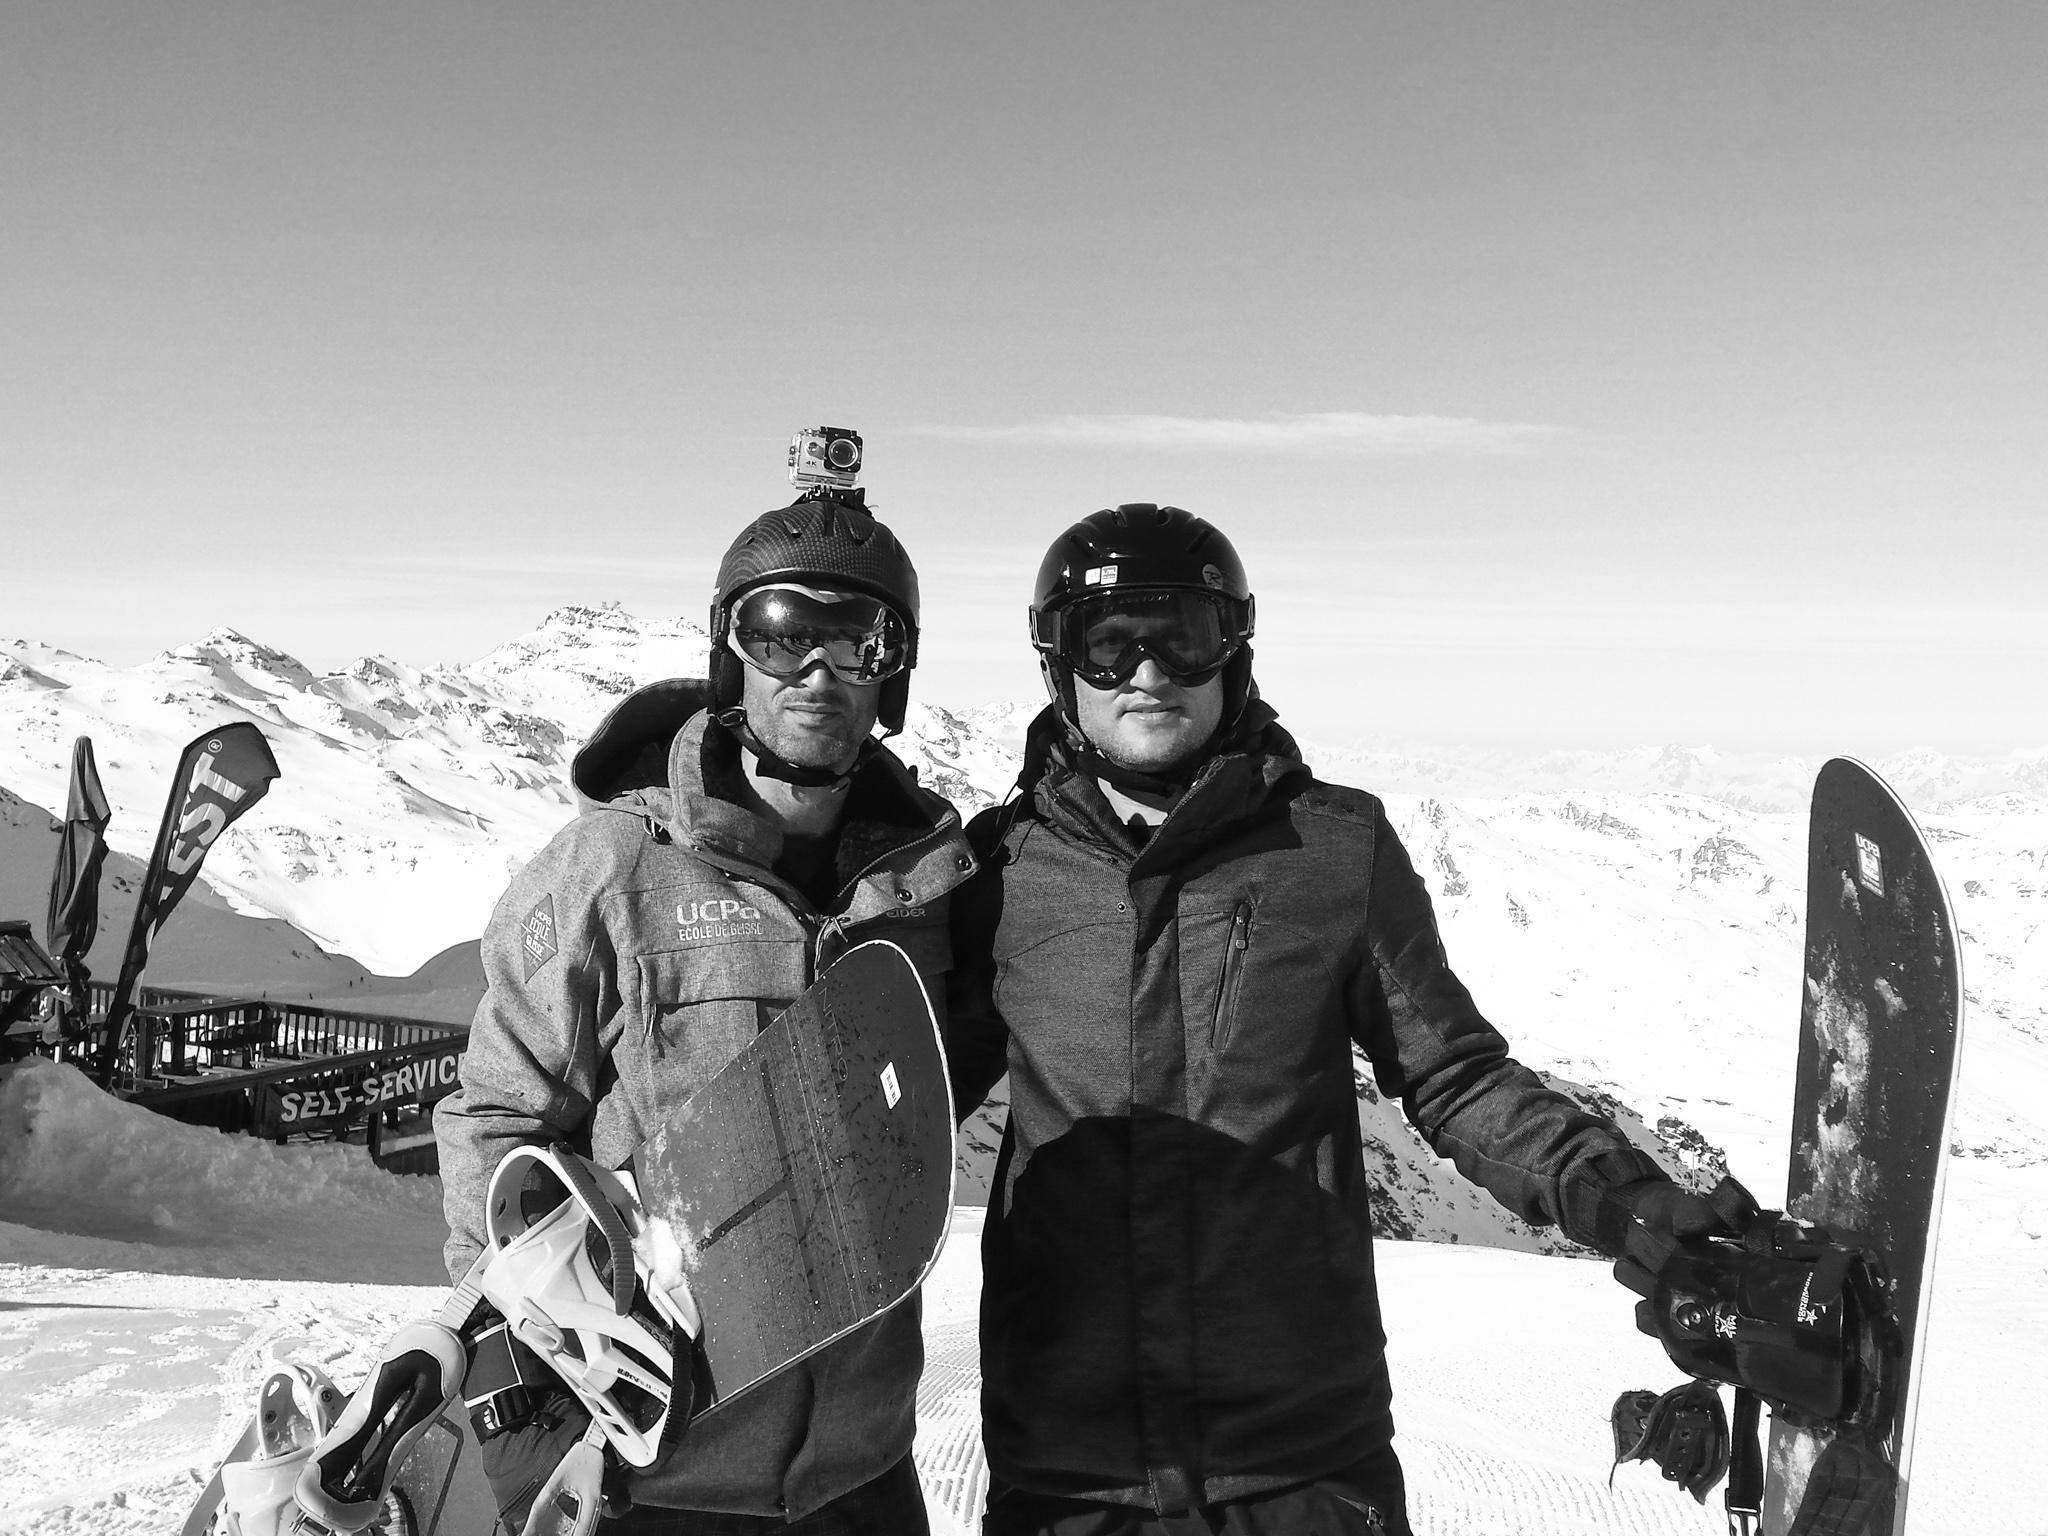 095731-val-thorens-snowboarder-portrait.jpg